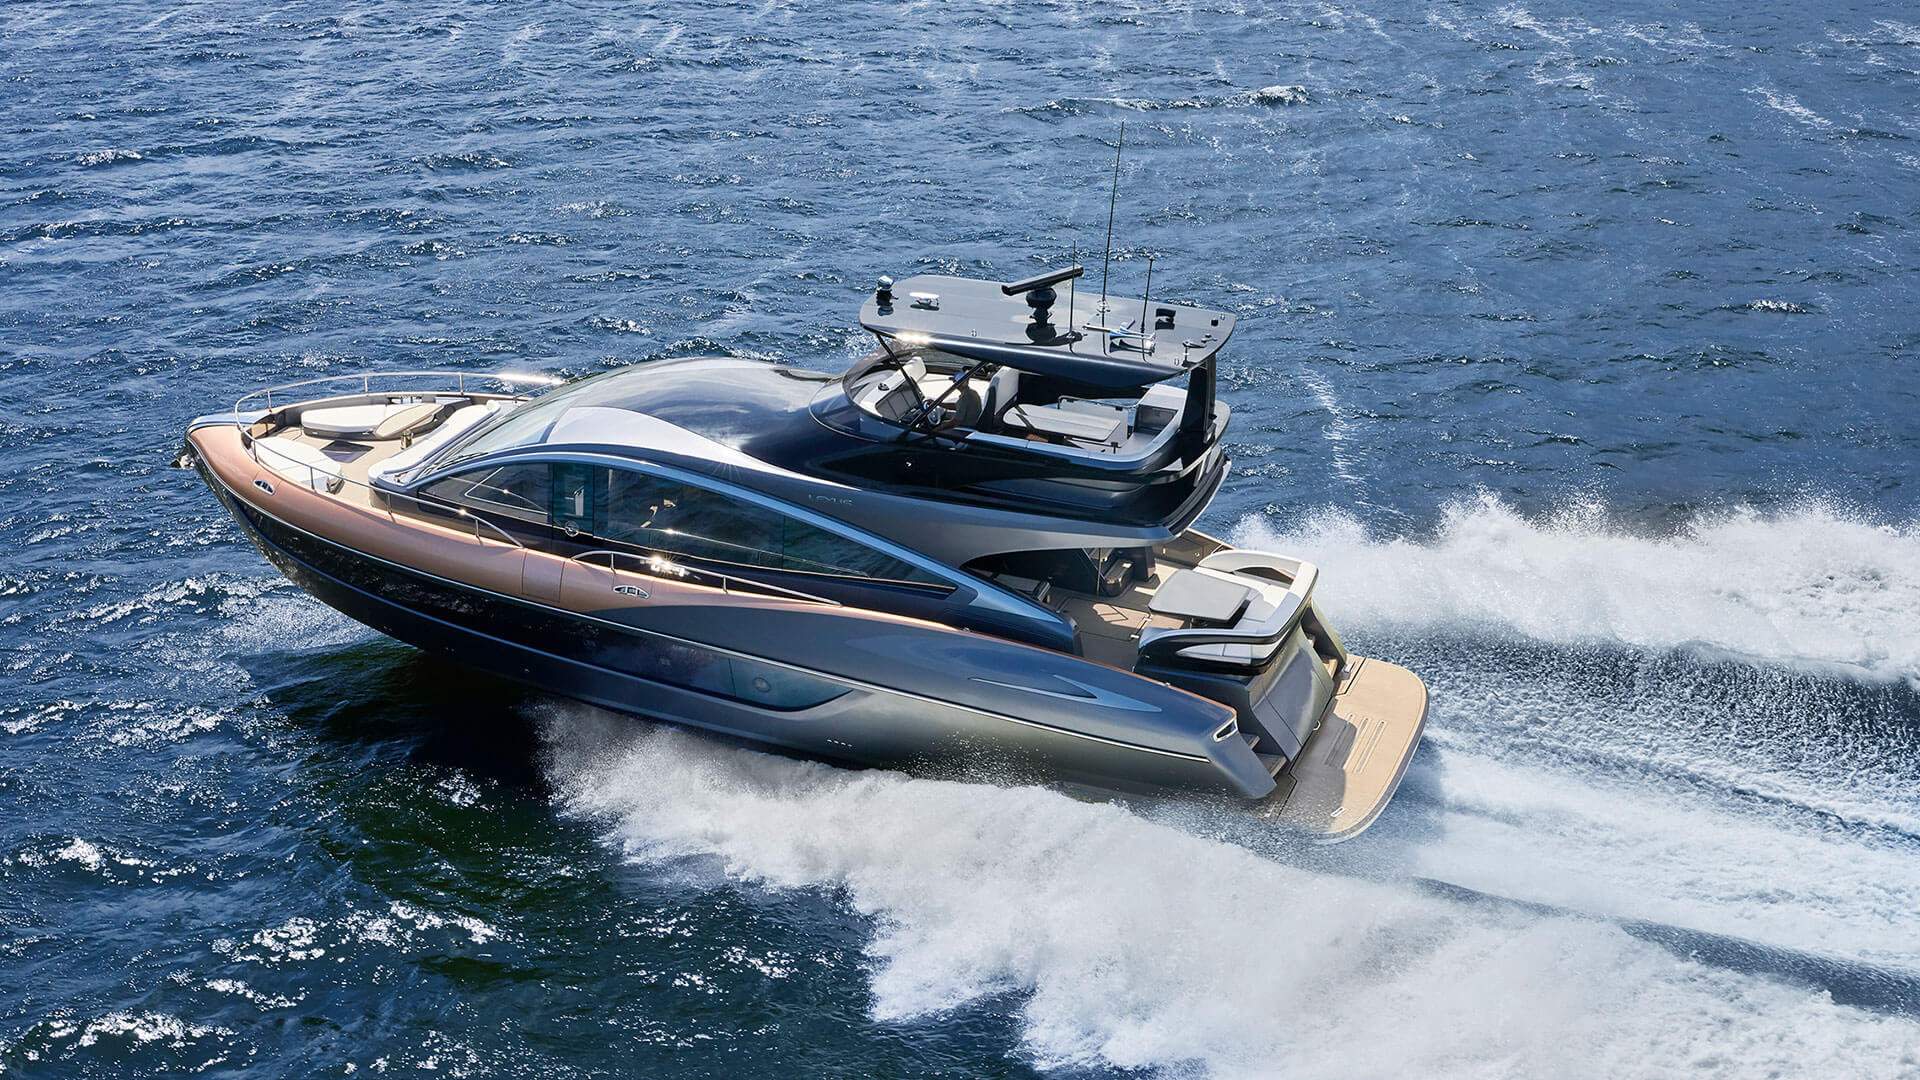 2020 lexus yacht ly 650 premiere gallery 07